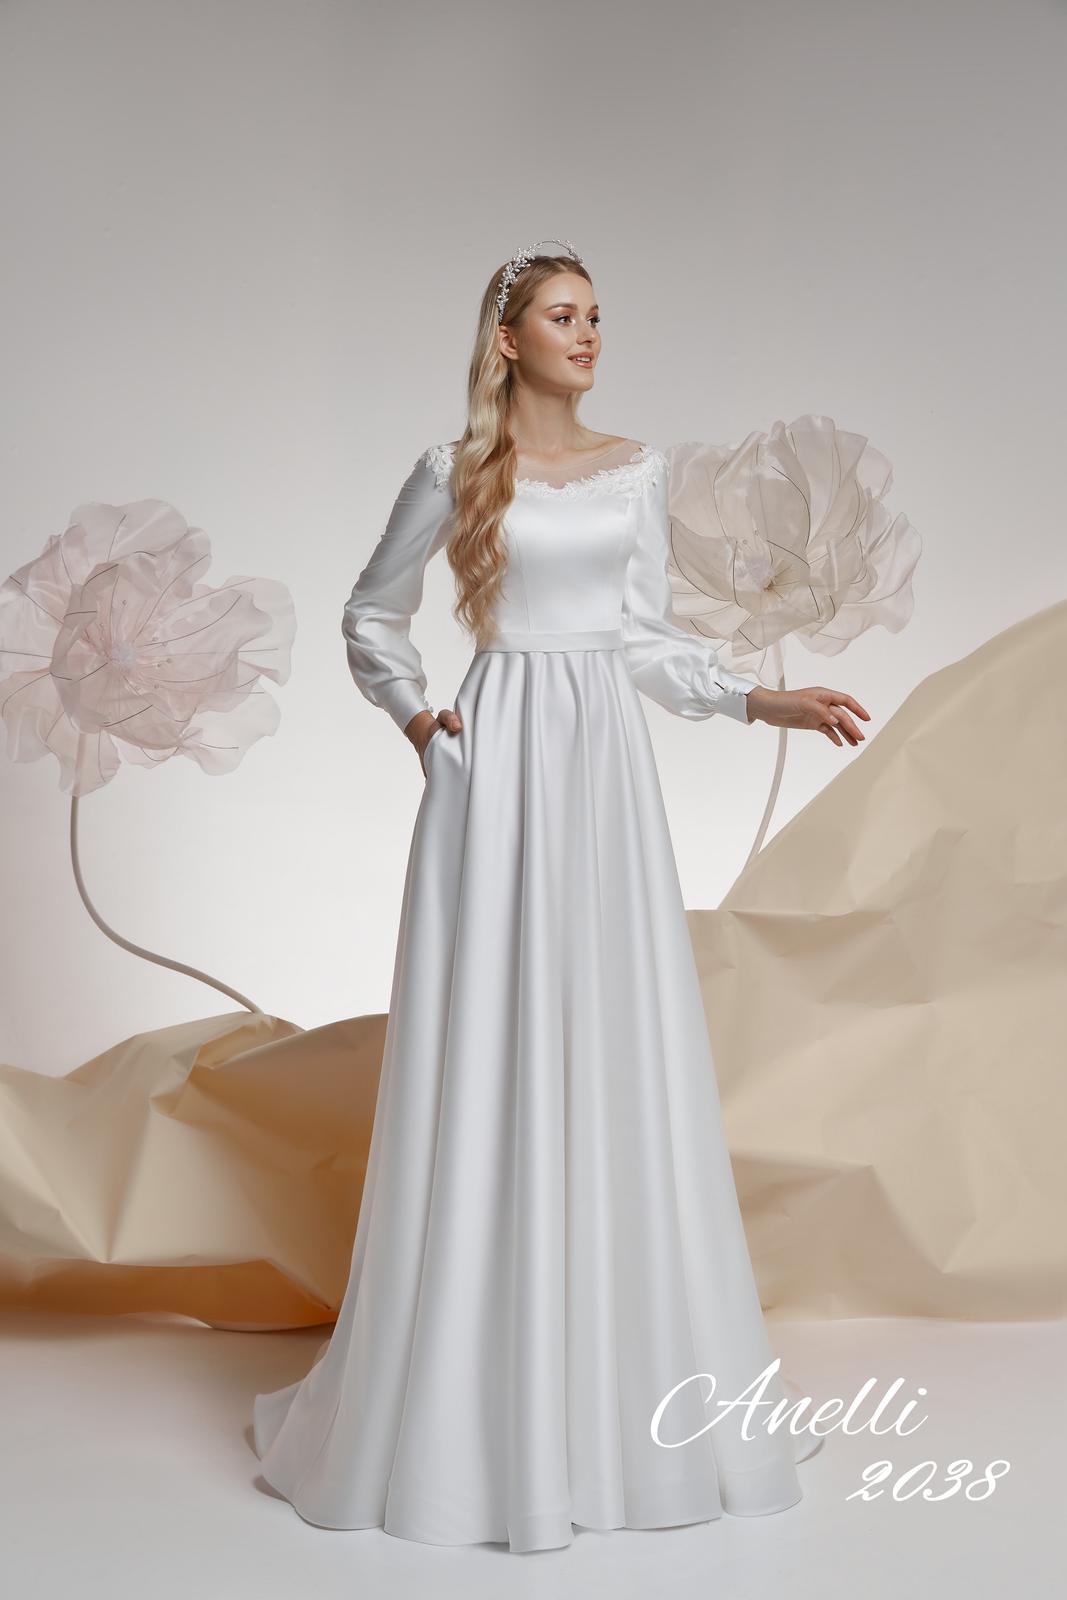 Svadobné šaty - Imagine 2038 - Obrázok č. 2